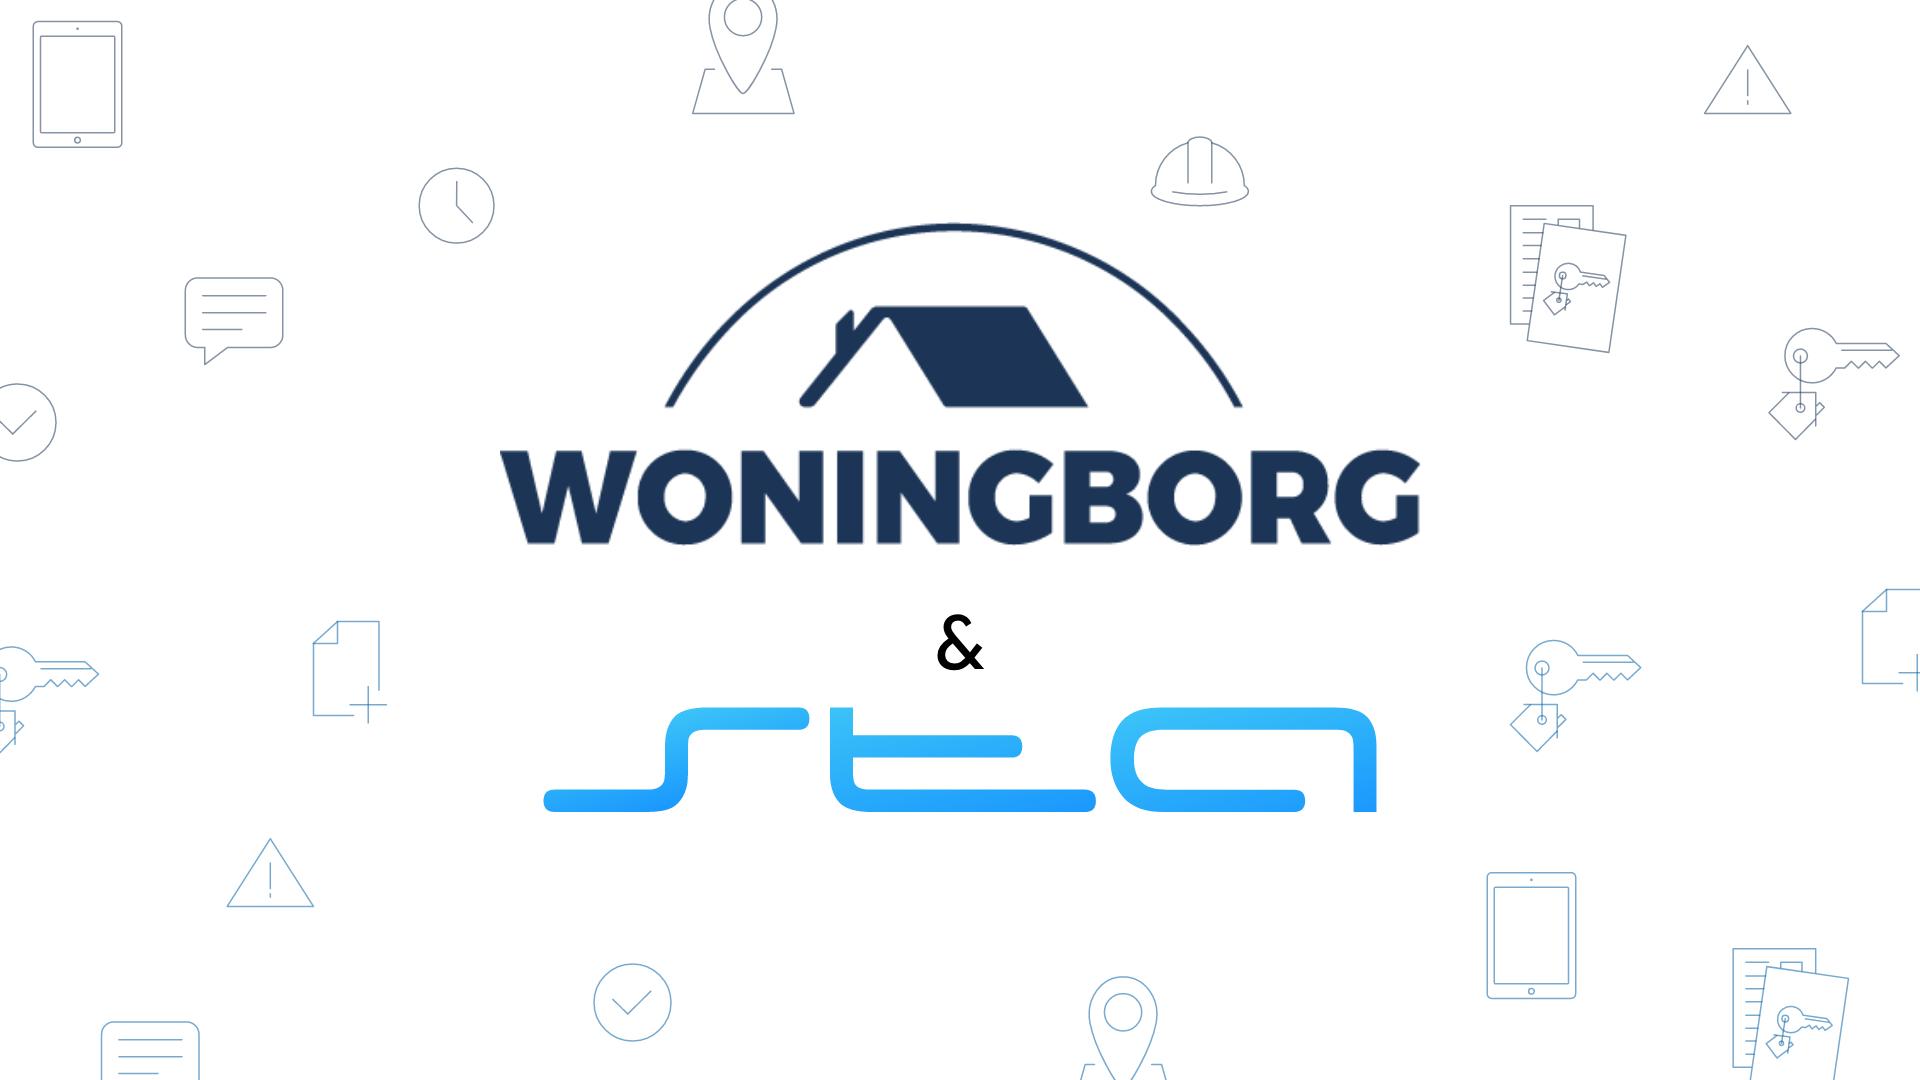 Woningborg koppeling